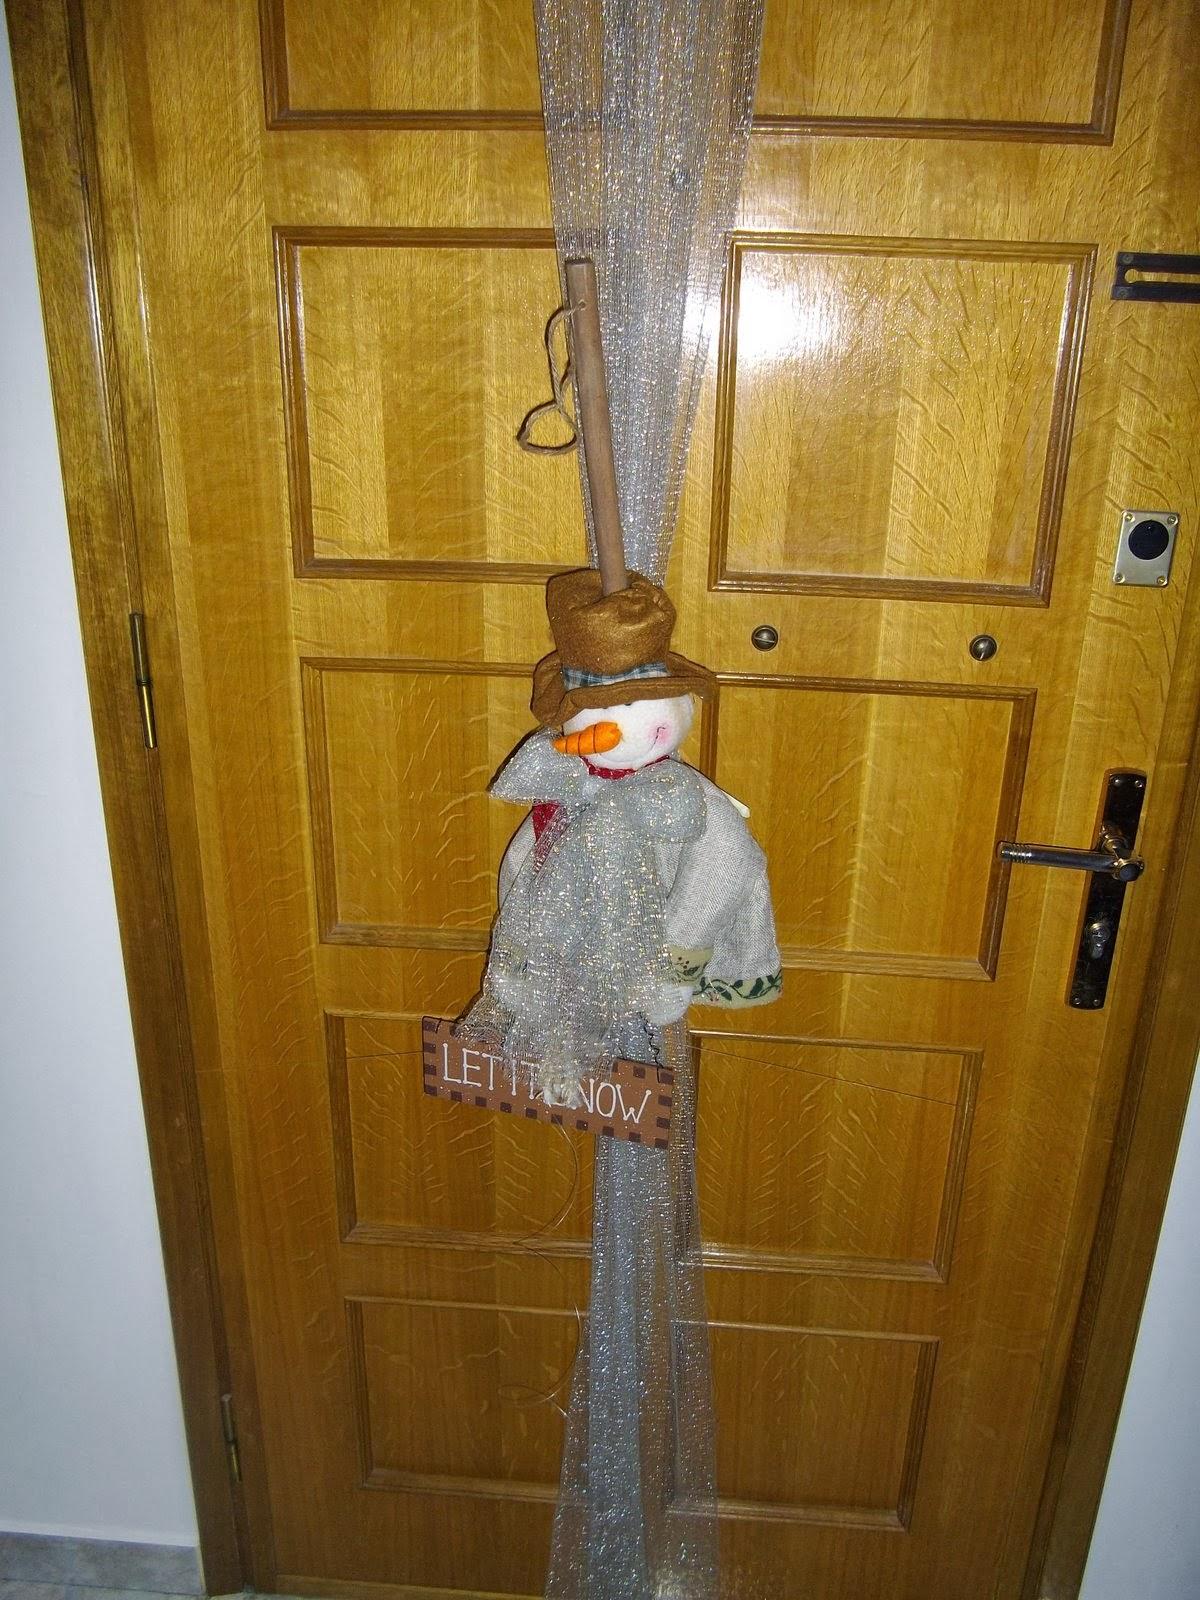 ba1b1b475bf Amanda's Handmade Creations: Στολισμός πόρτας για να ξεχωρίζουμε.